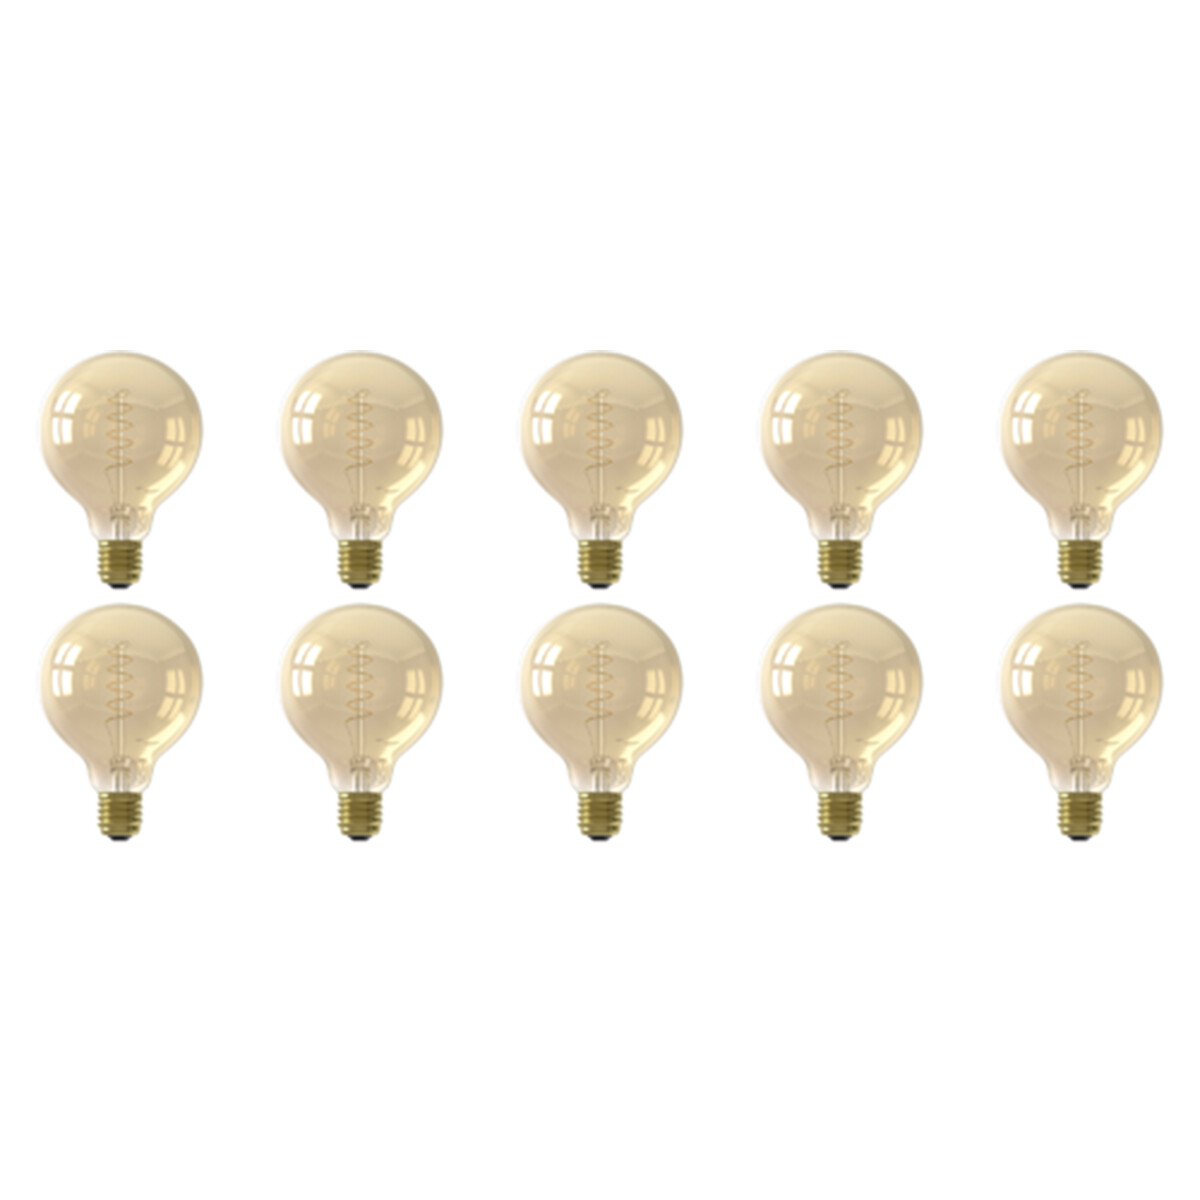 CALEX - LED Lamp 10 Pack - Globe - Filament G95 - E27 Fitting - Dimbaar - 4W - Warm Wit 2100K - Ambe